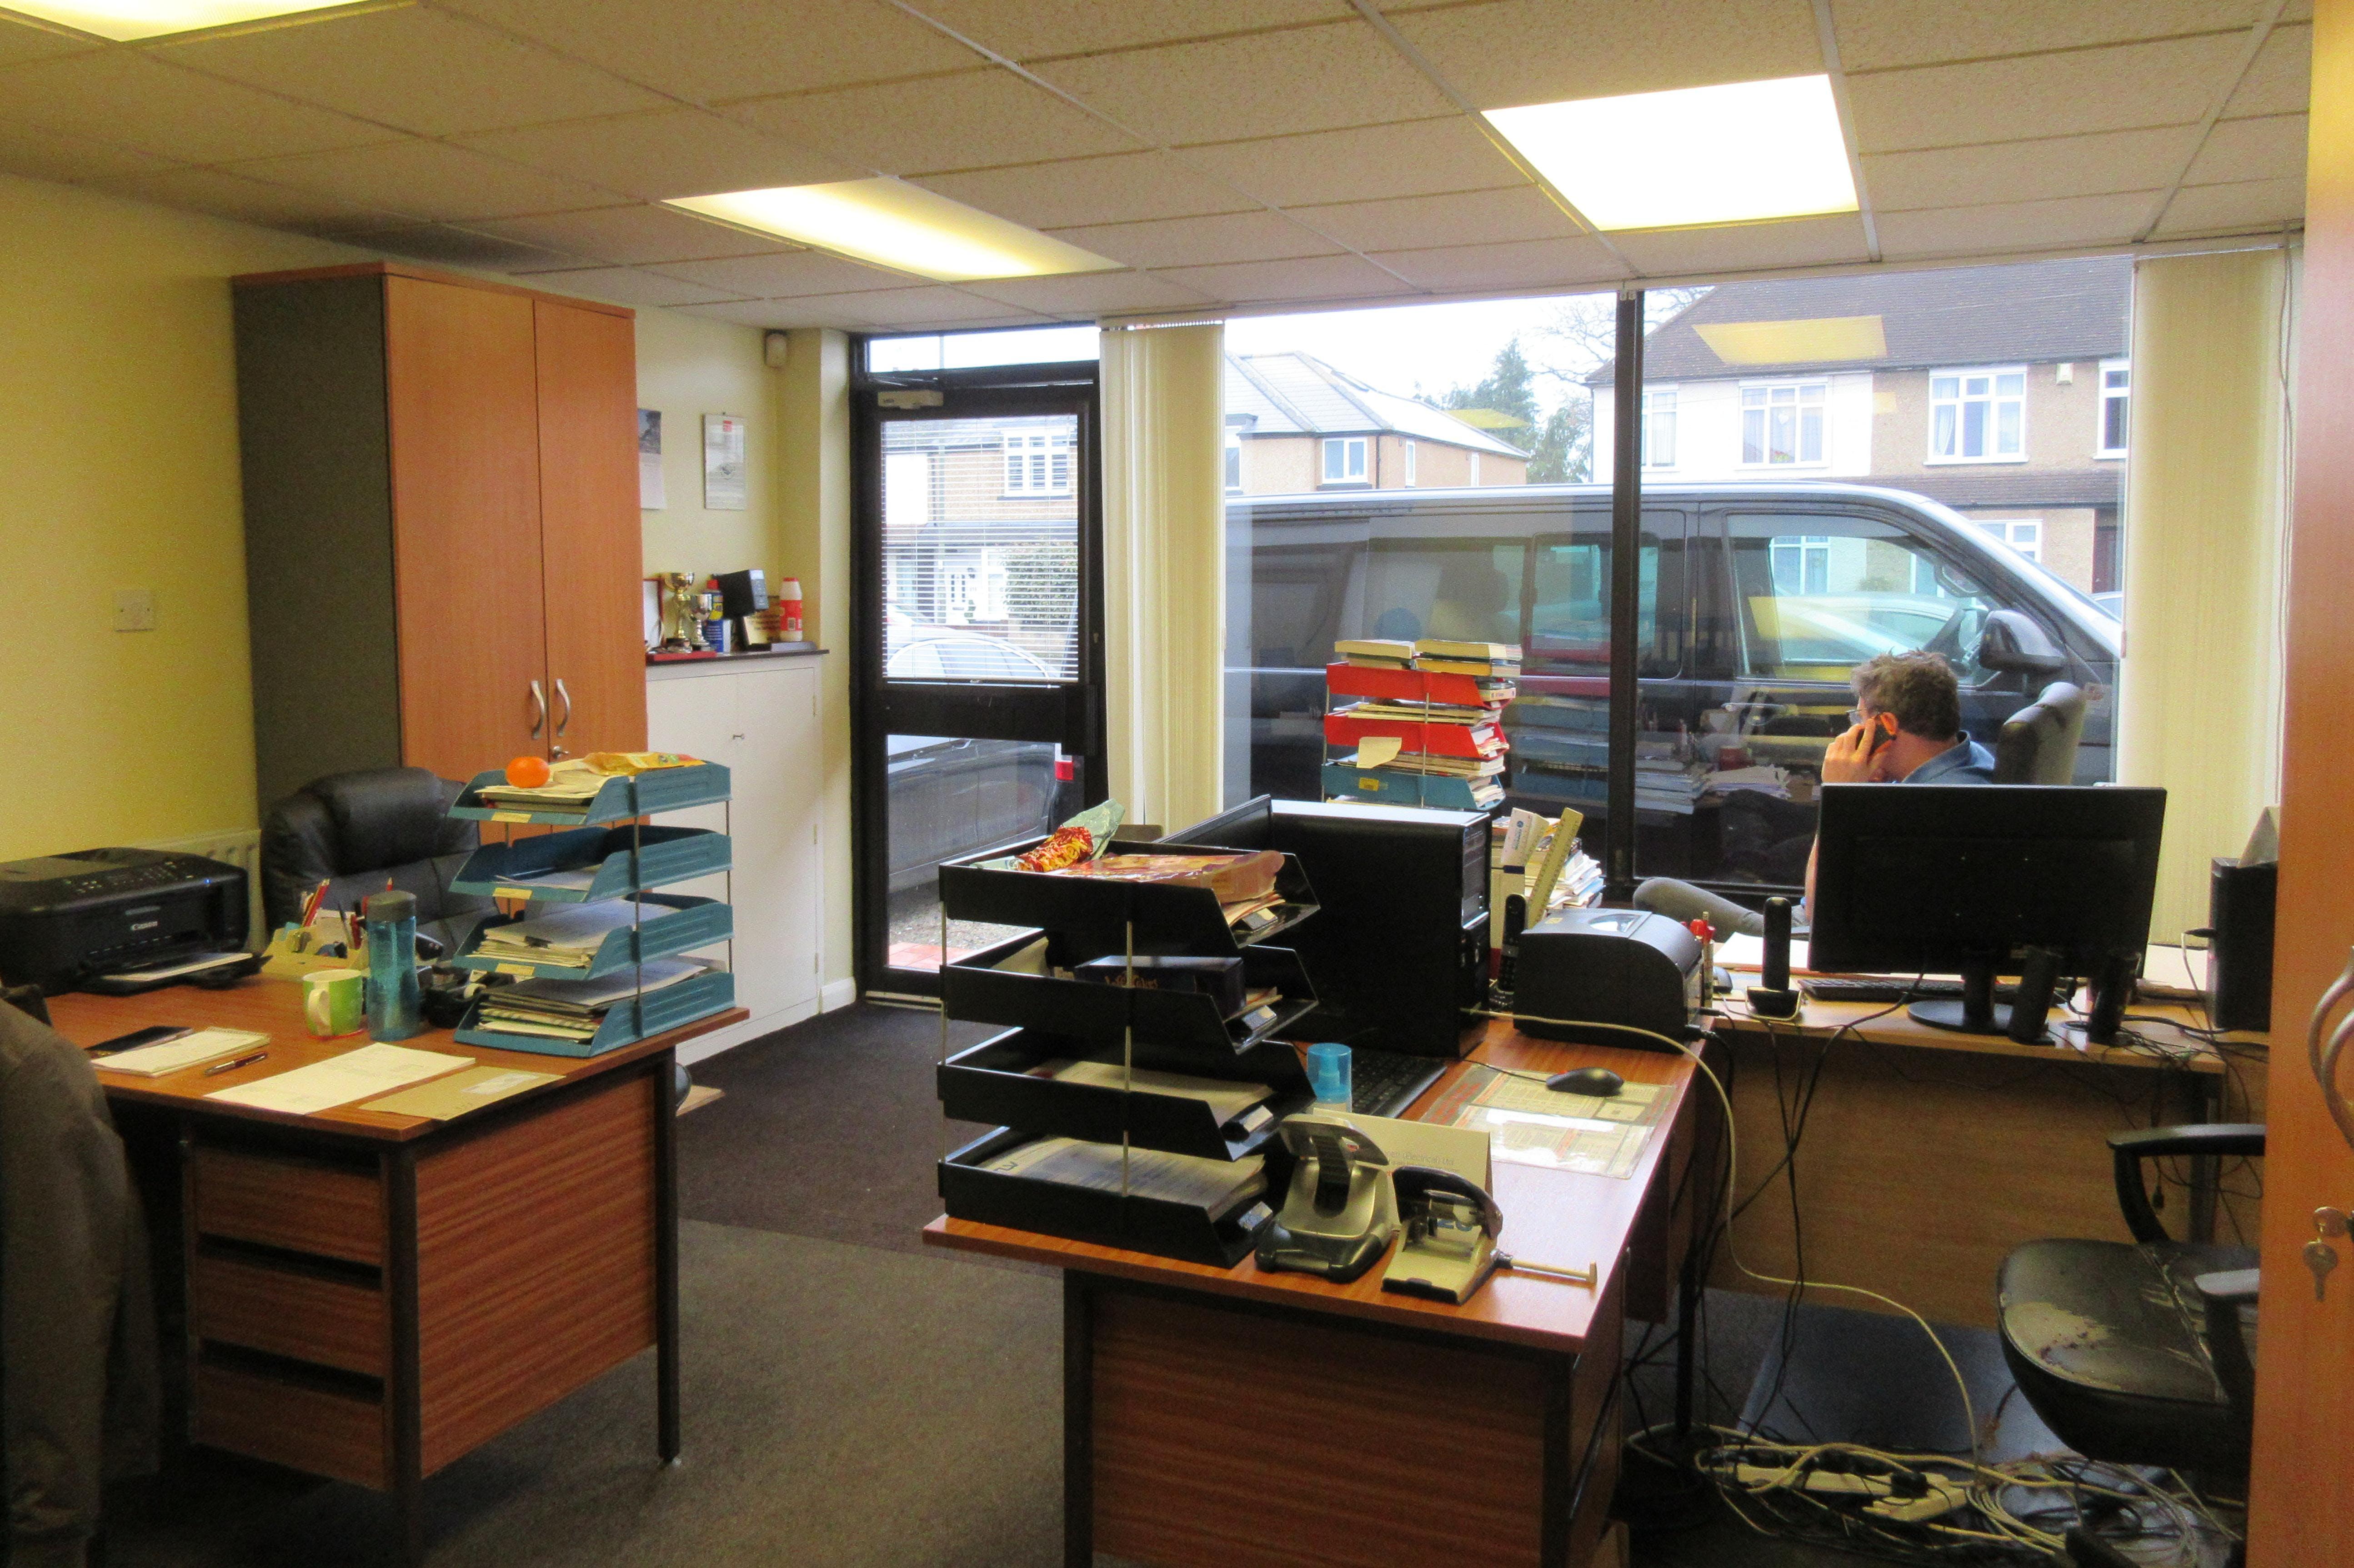 278 Woodham Lane, New Haw, Office, Retail, Investment, Development For Sale - IMG_1657.JPG